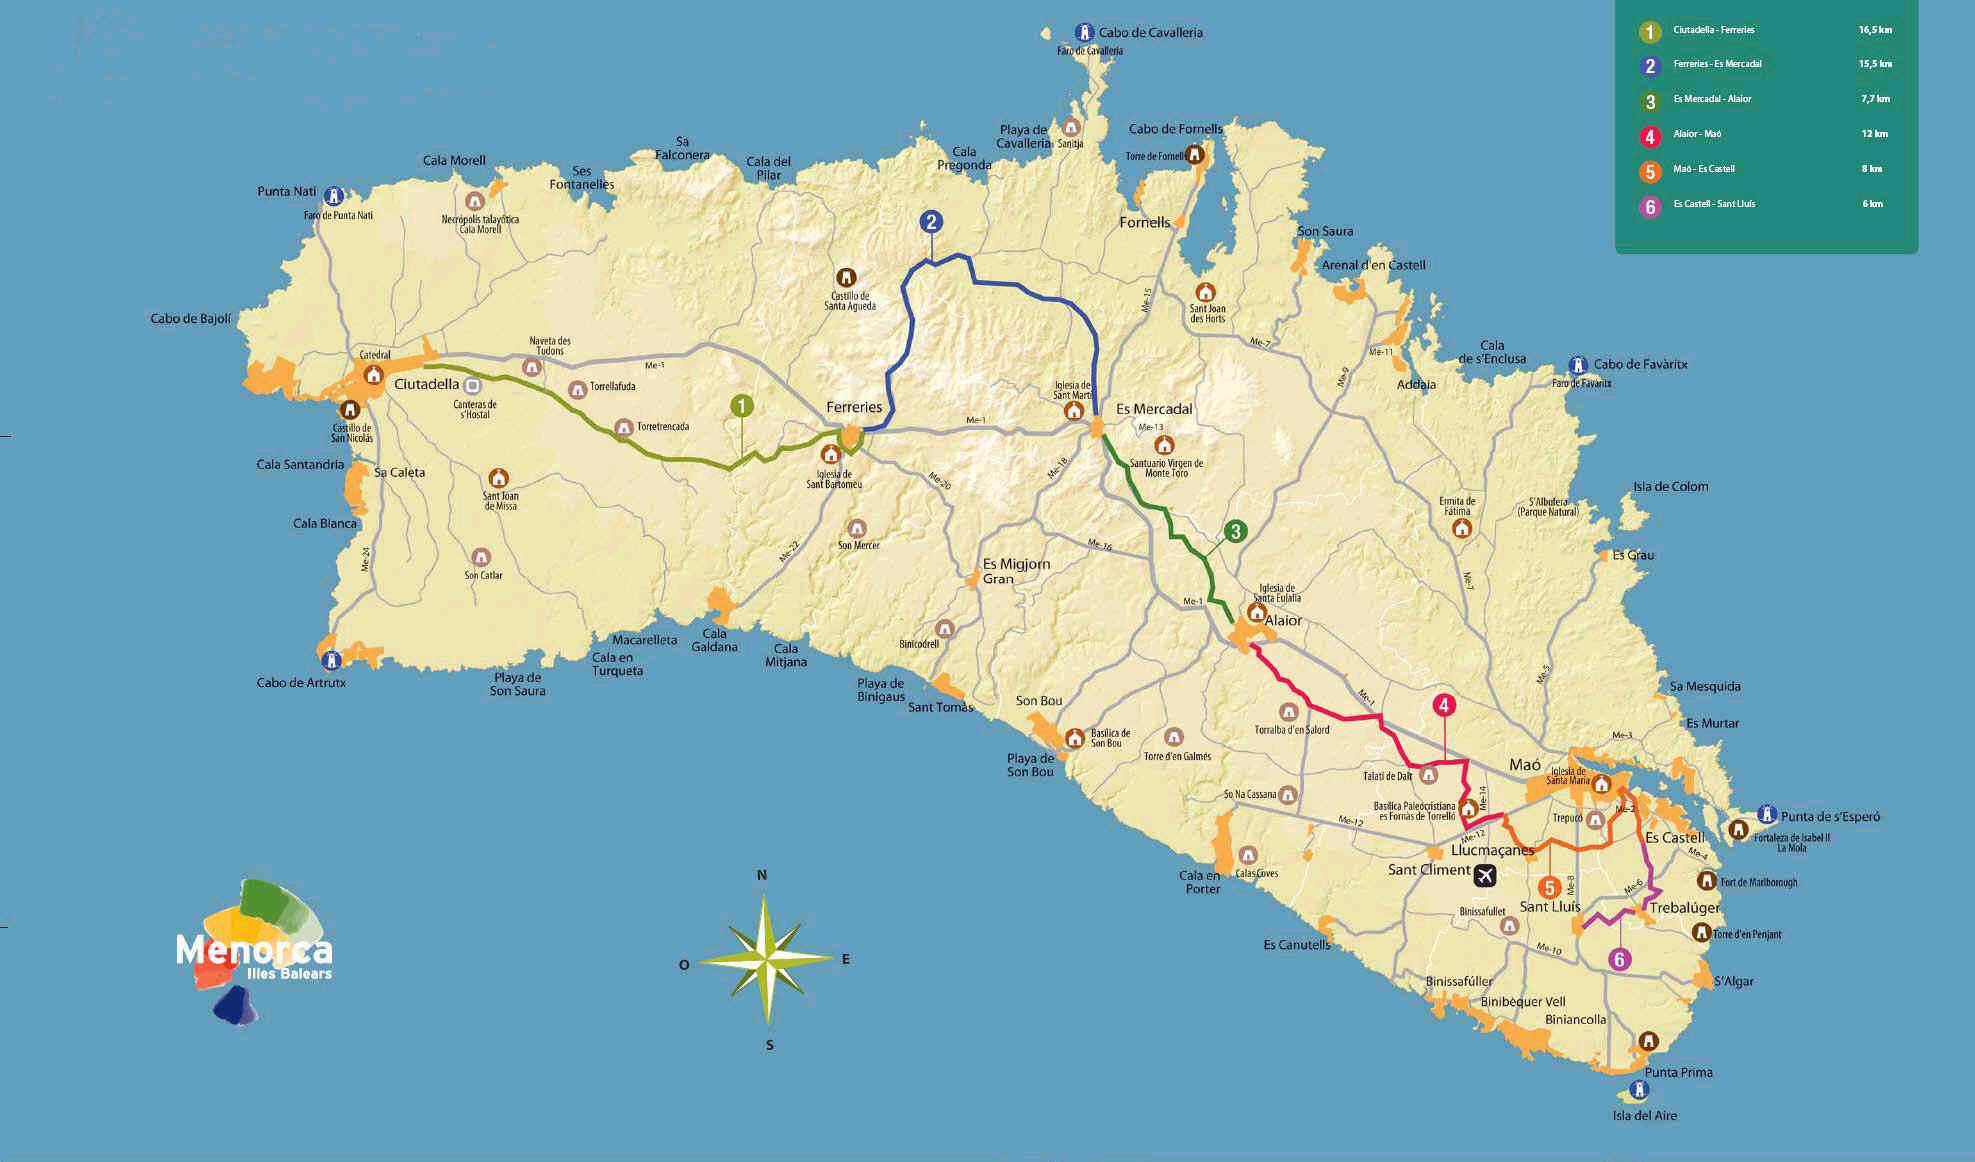 mapa_menorca_cicloturista